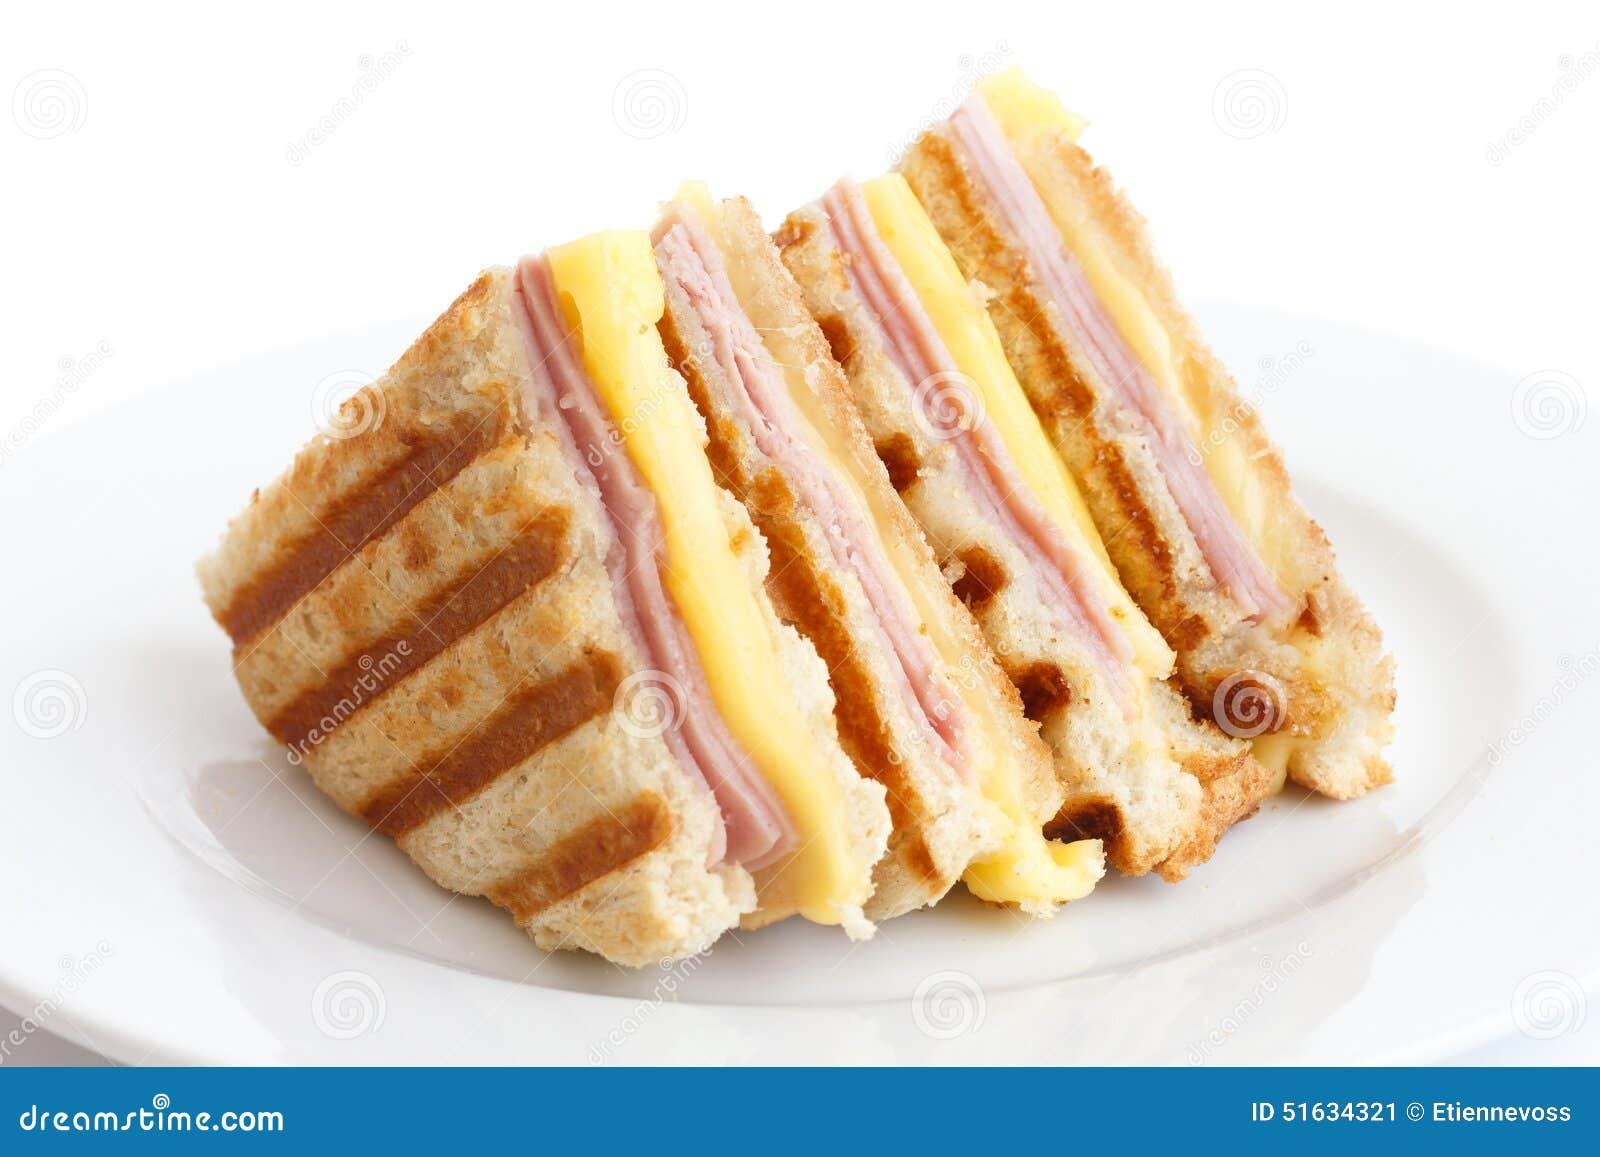 Toasted ham and cheese panini.